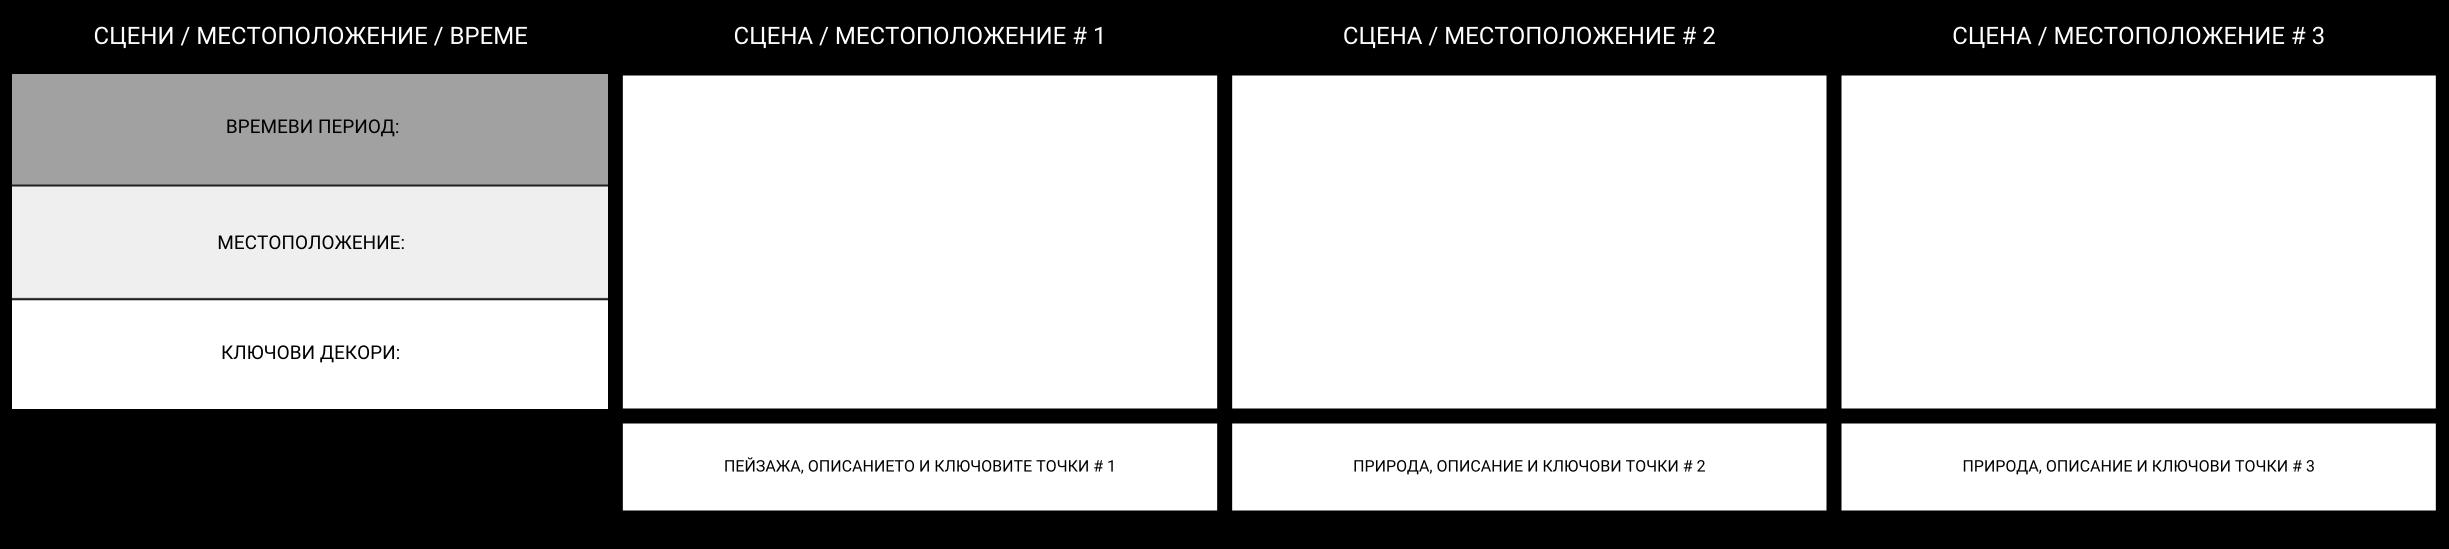 Пример за Сценарий на Сцена